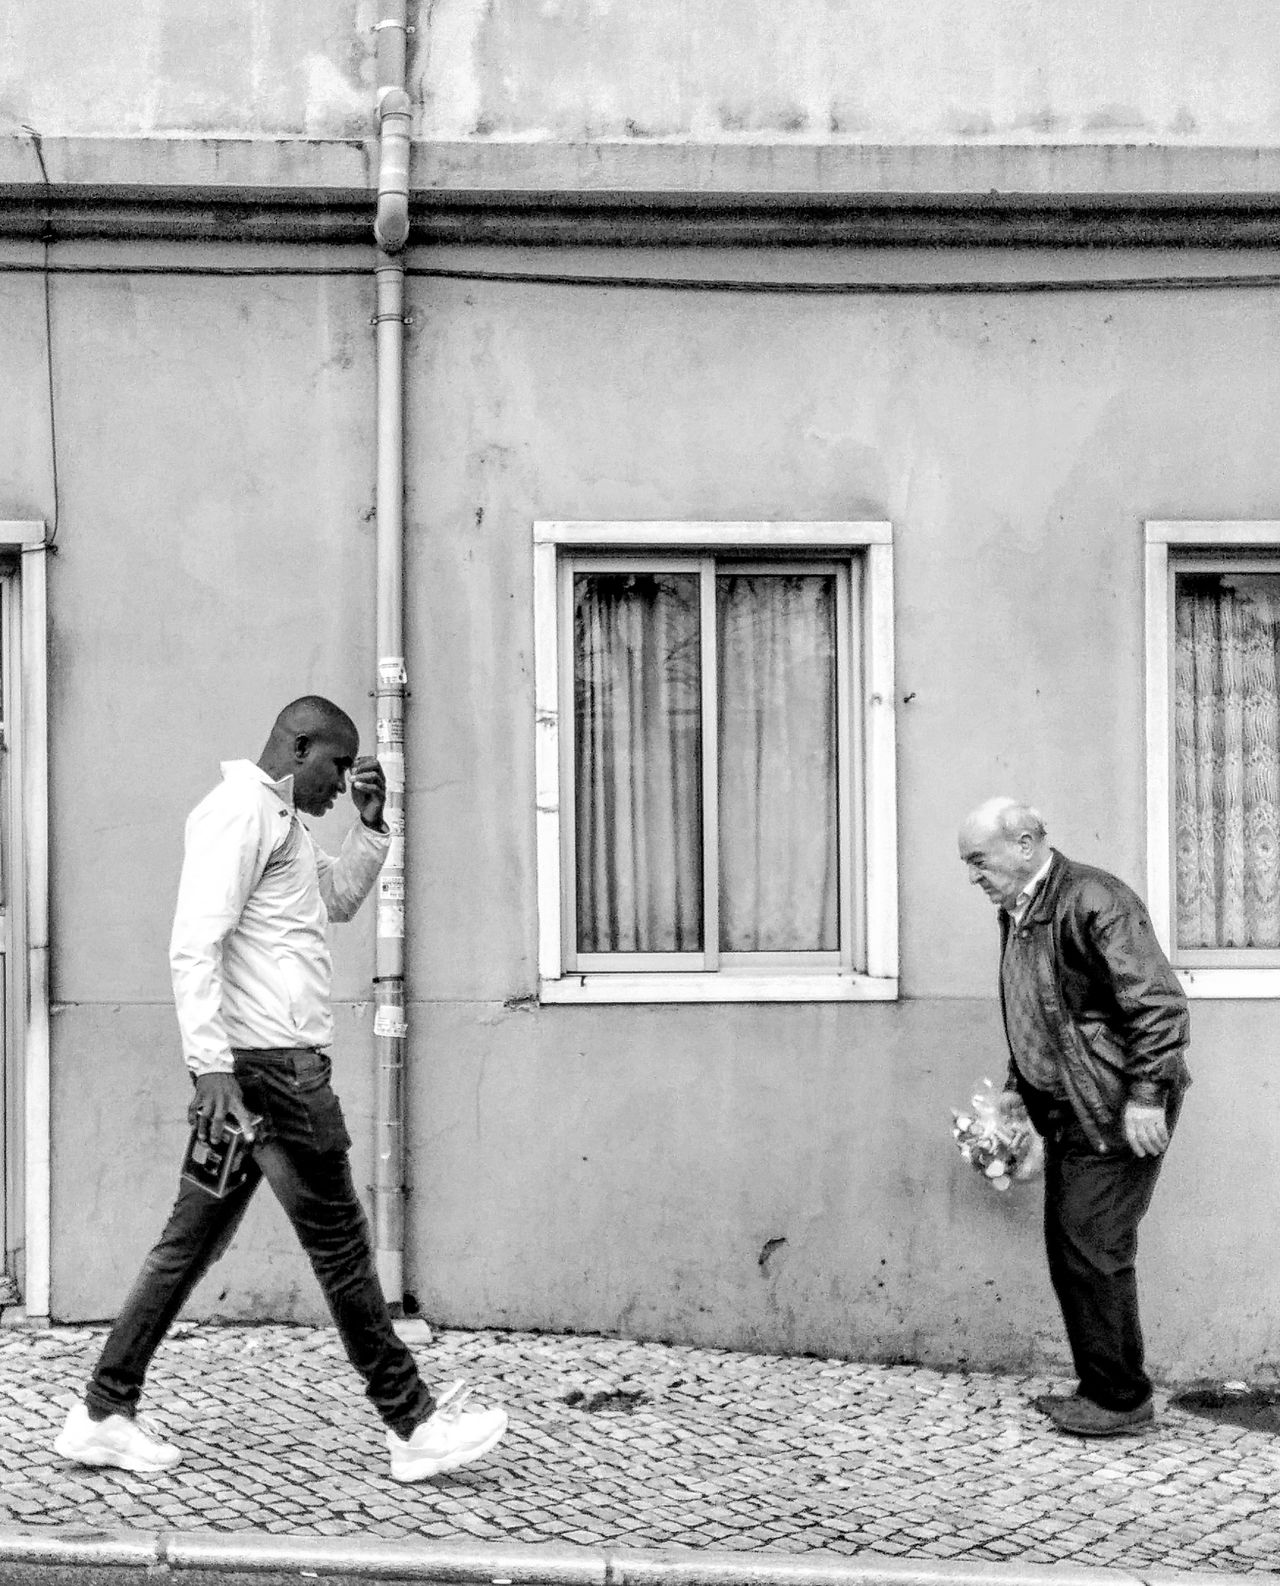 Show Yourself Dont Be Afraid  Mastodon Street Photography